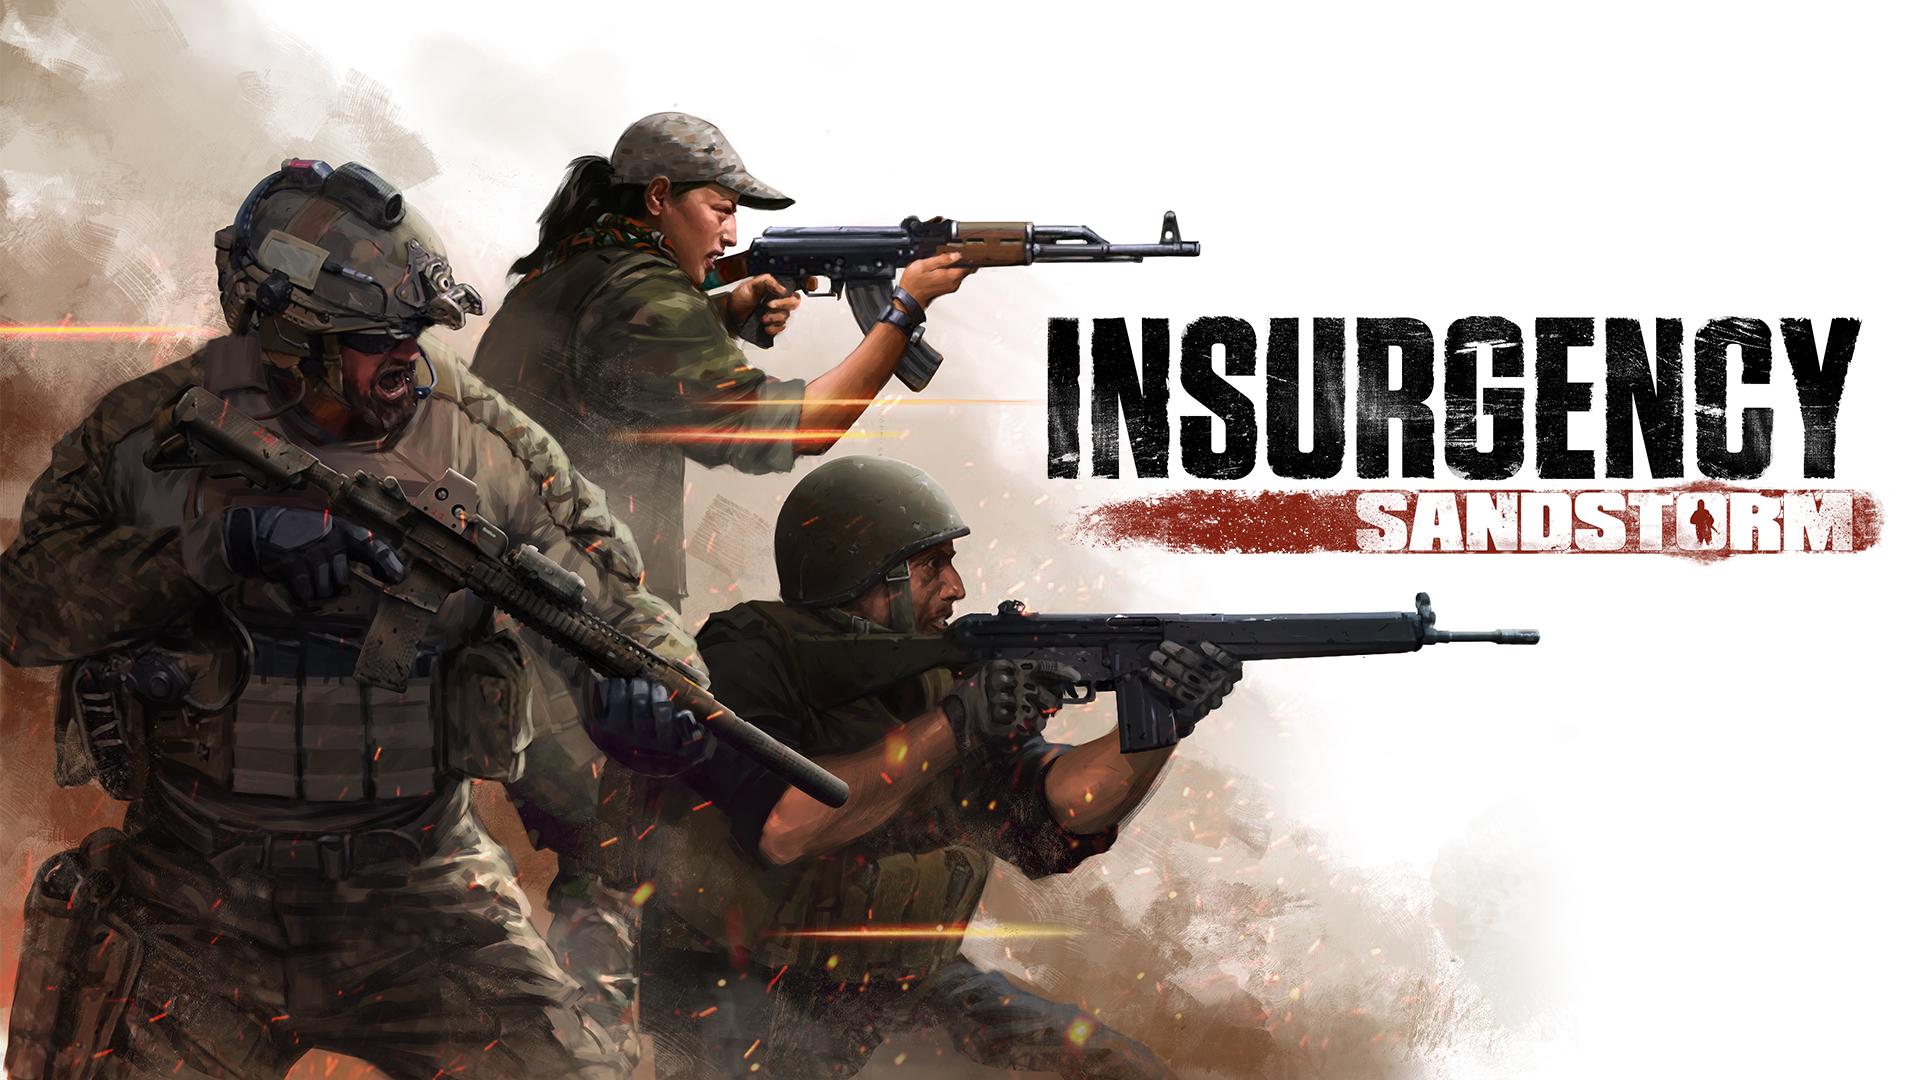 Insurgency: Sandstorm - key art